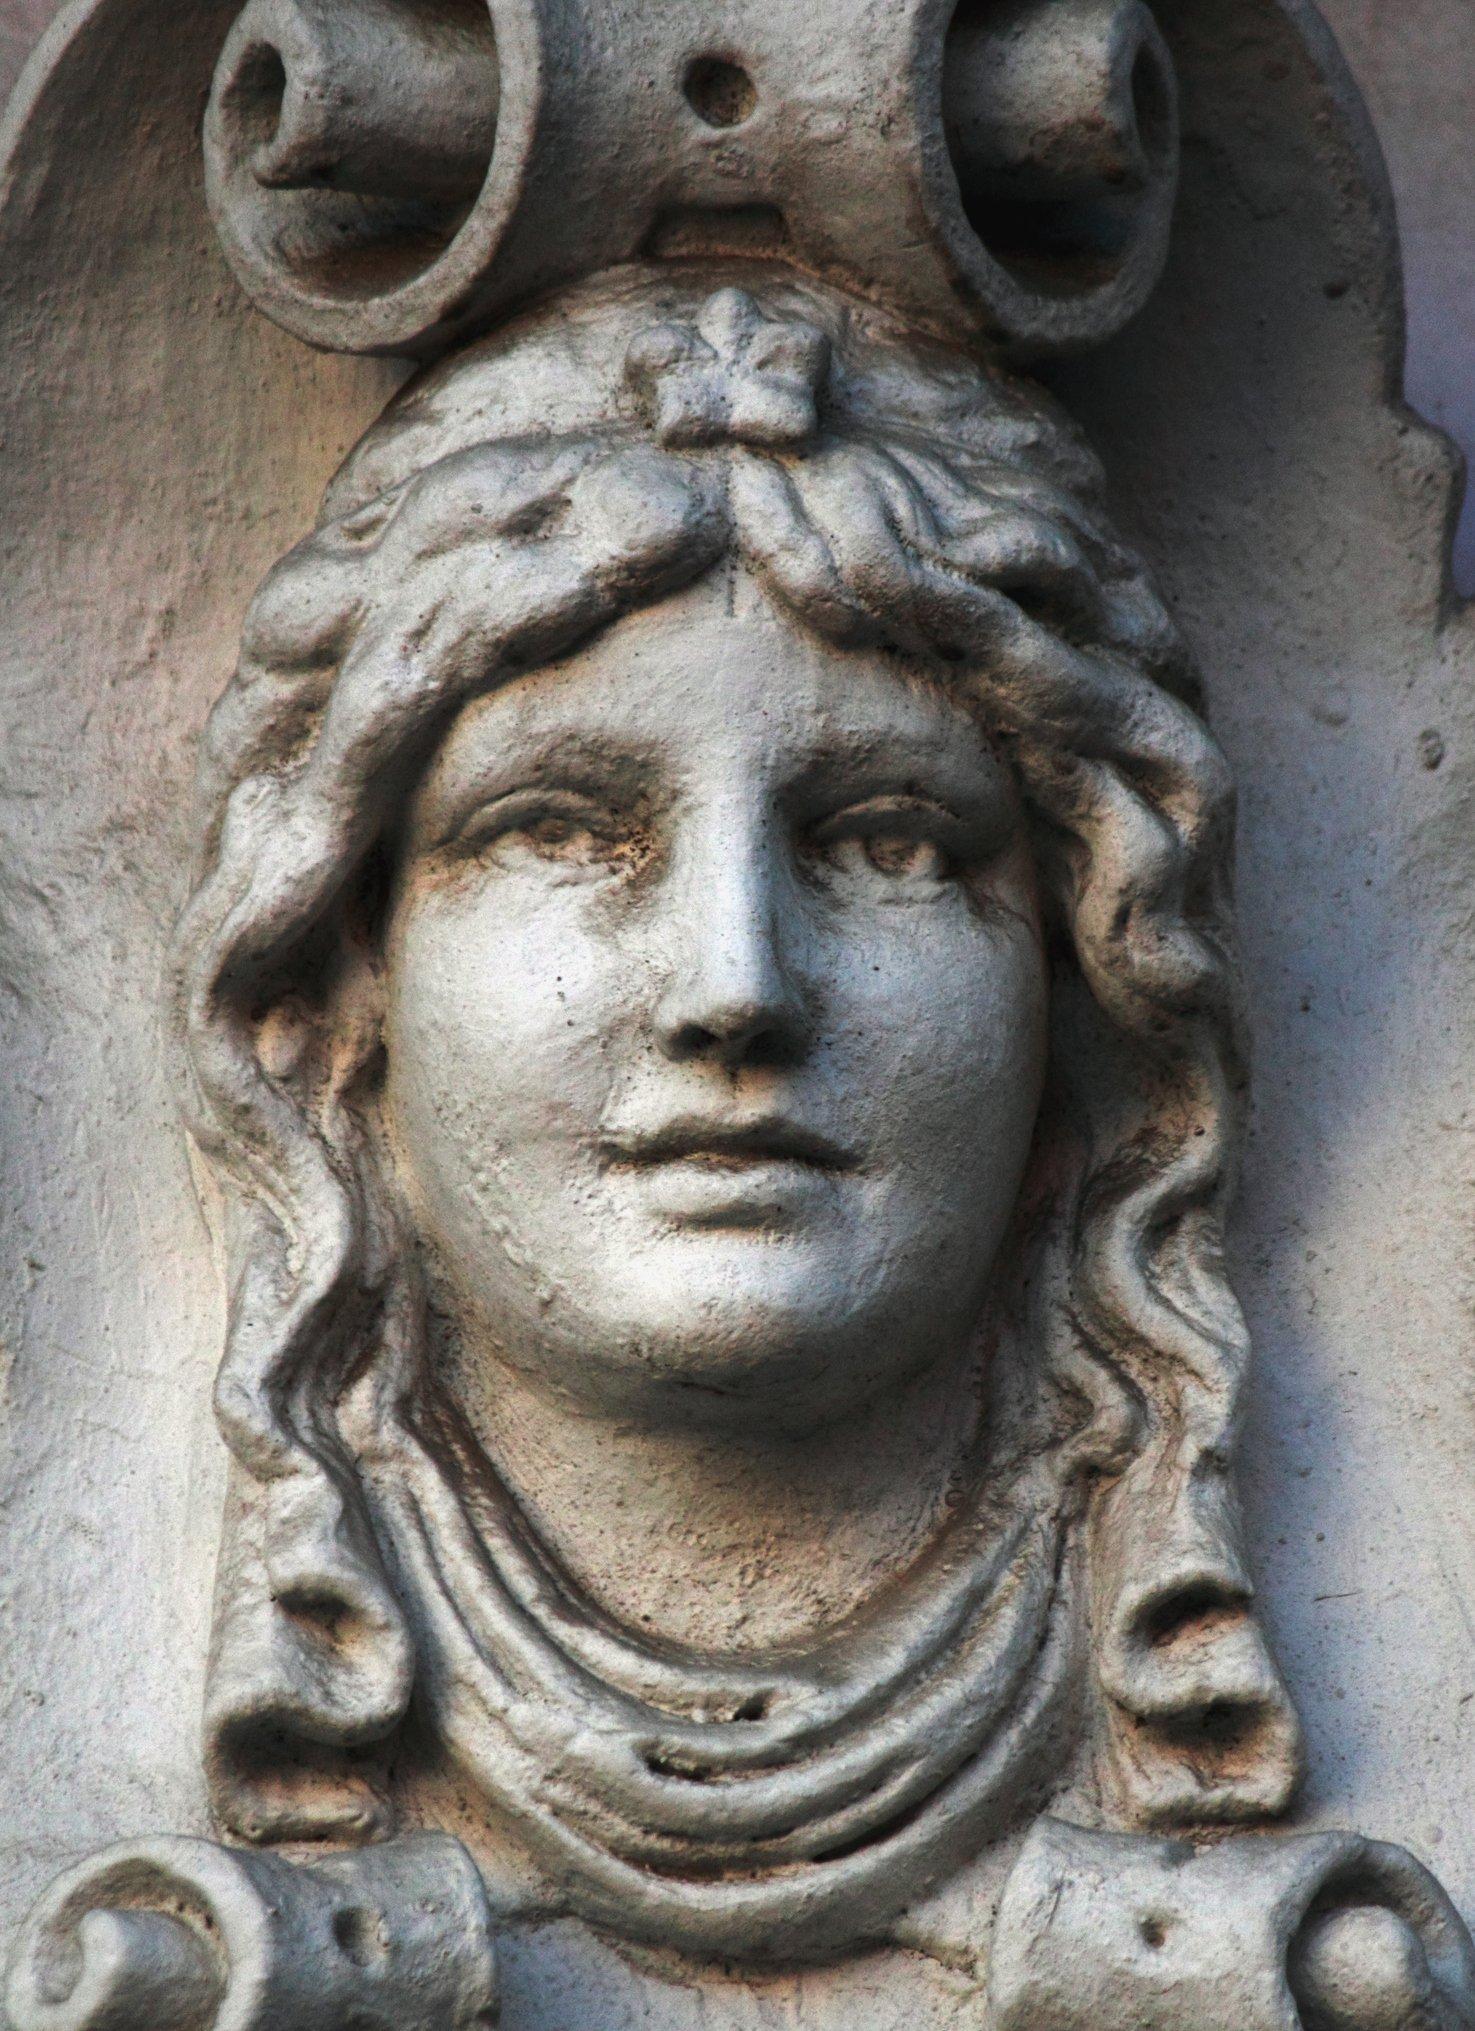 Queen Hera, the sister and wife of Zeus. (iStock Photo)